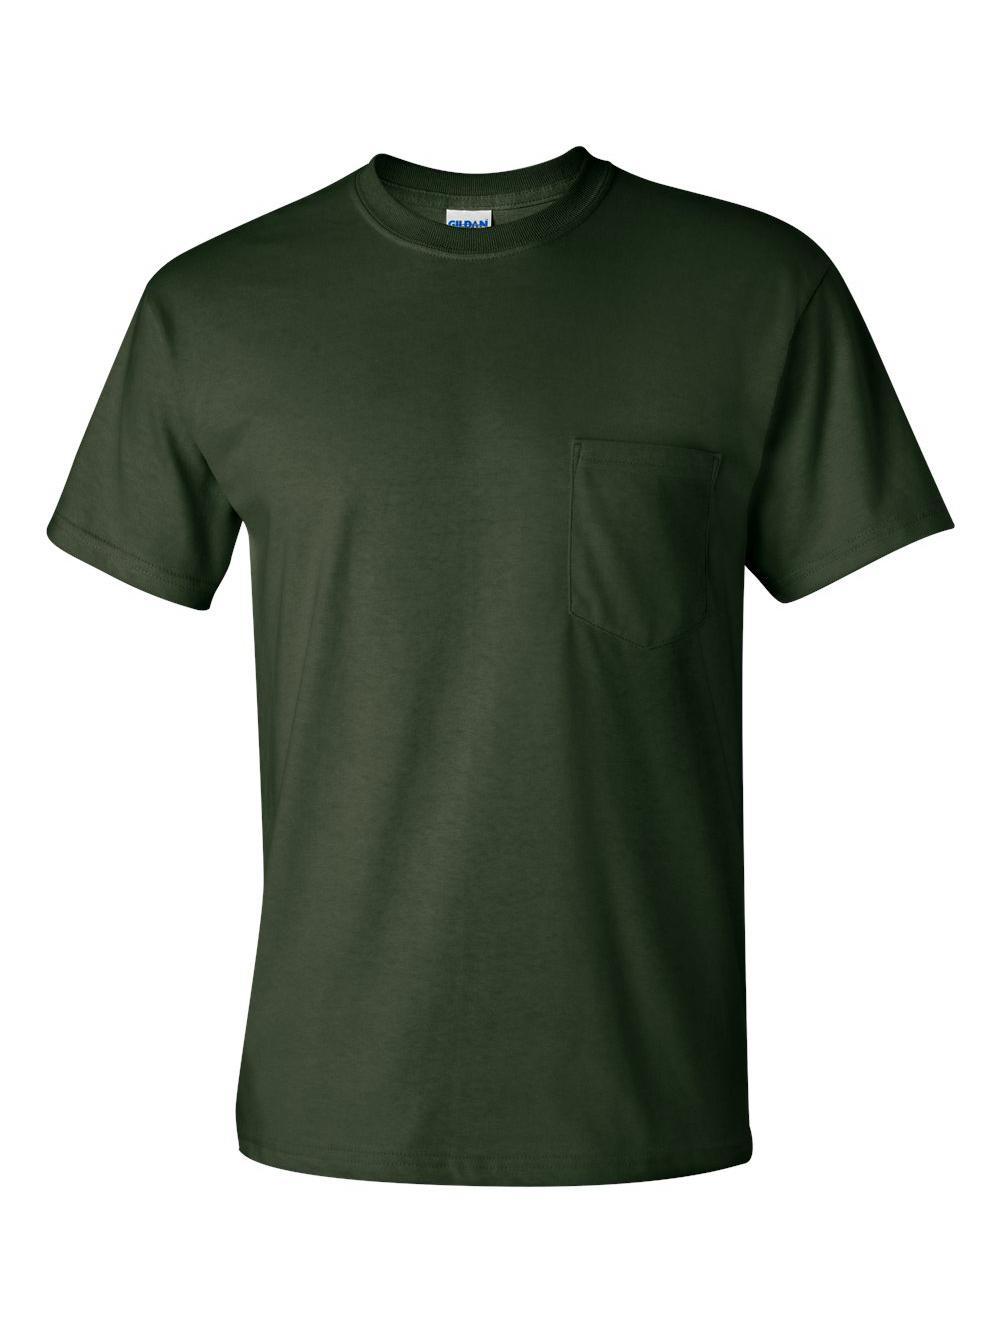 Gildan-Ultra-Cotton-T-Shirt-with-a-Pocket-2300 thumbnail 12